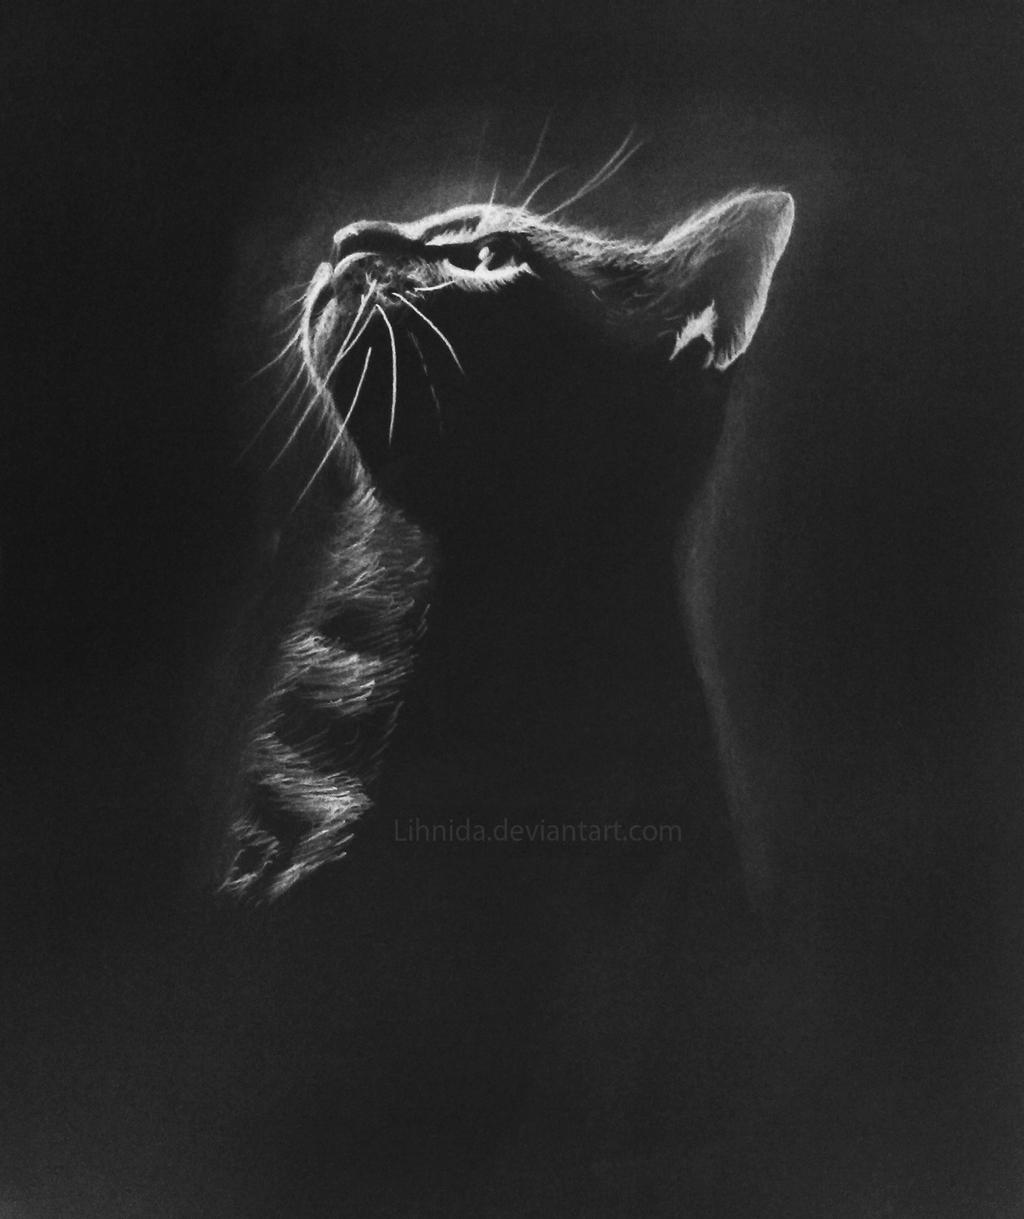 Kitten - Inverted colors by lihnida